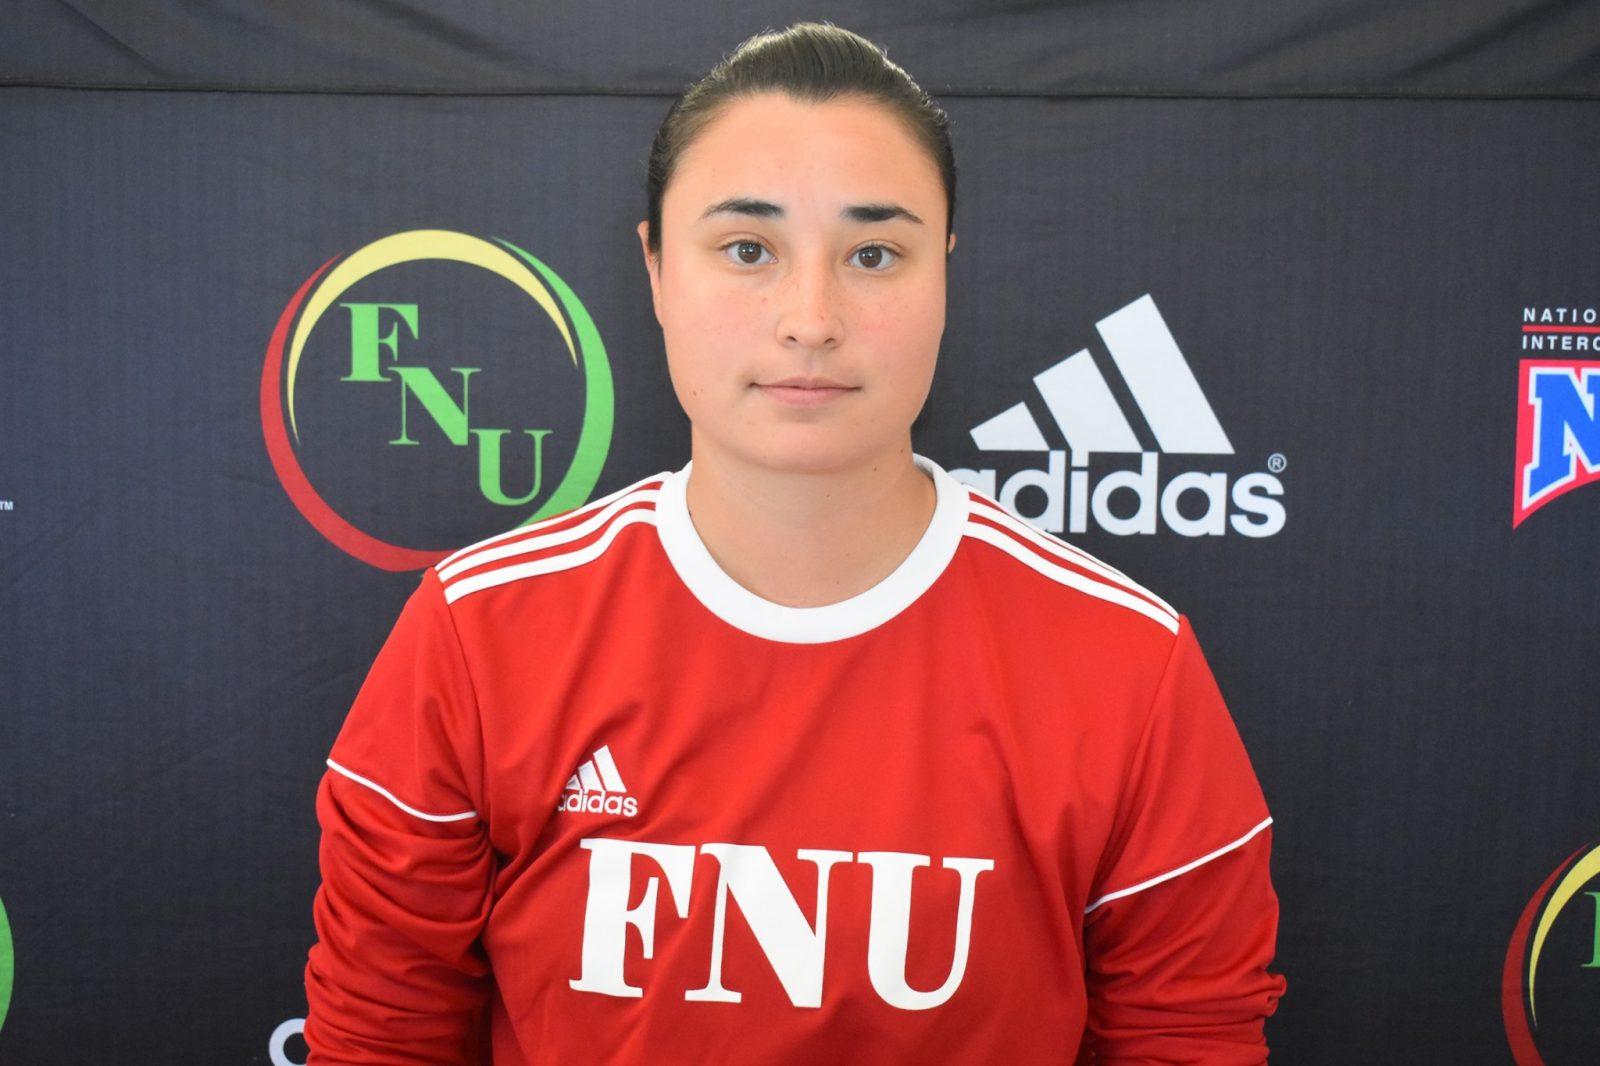 FNU Women's soccer player Vanesa Osorio